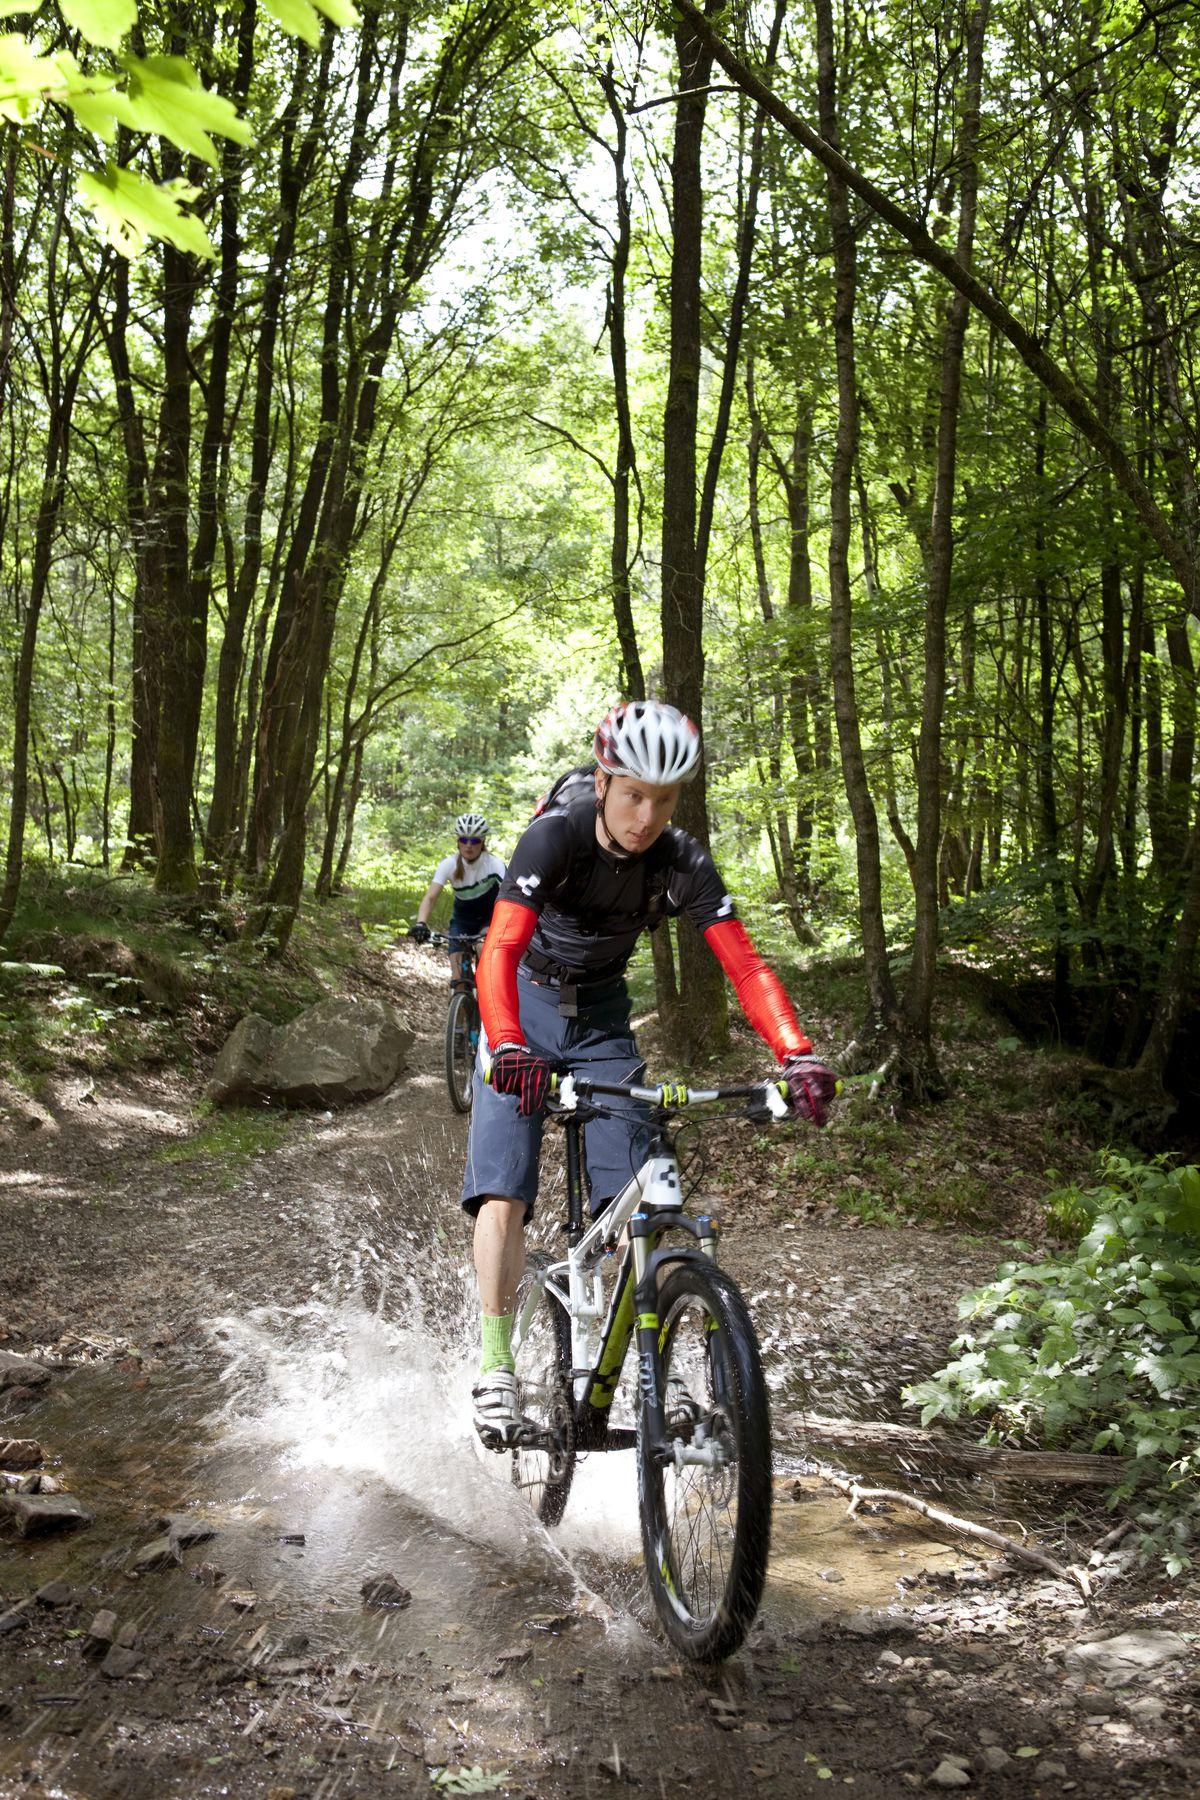 mountainbike tochten site officiel du tourisme en. Black Bedroom Furniture Sets. Home Design Ideas